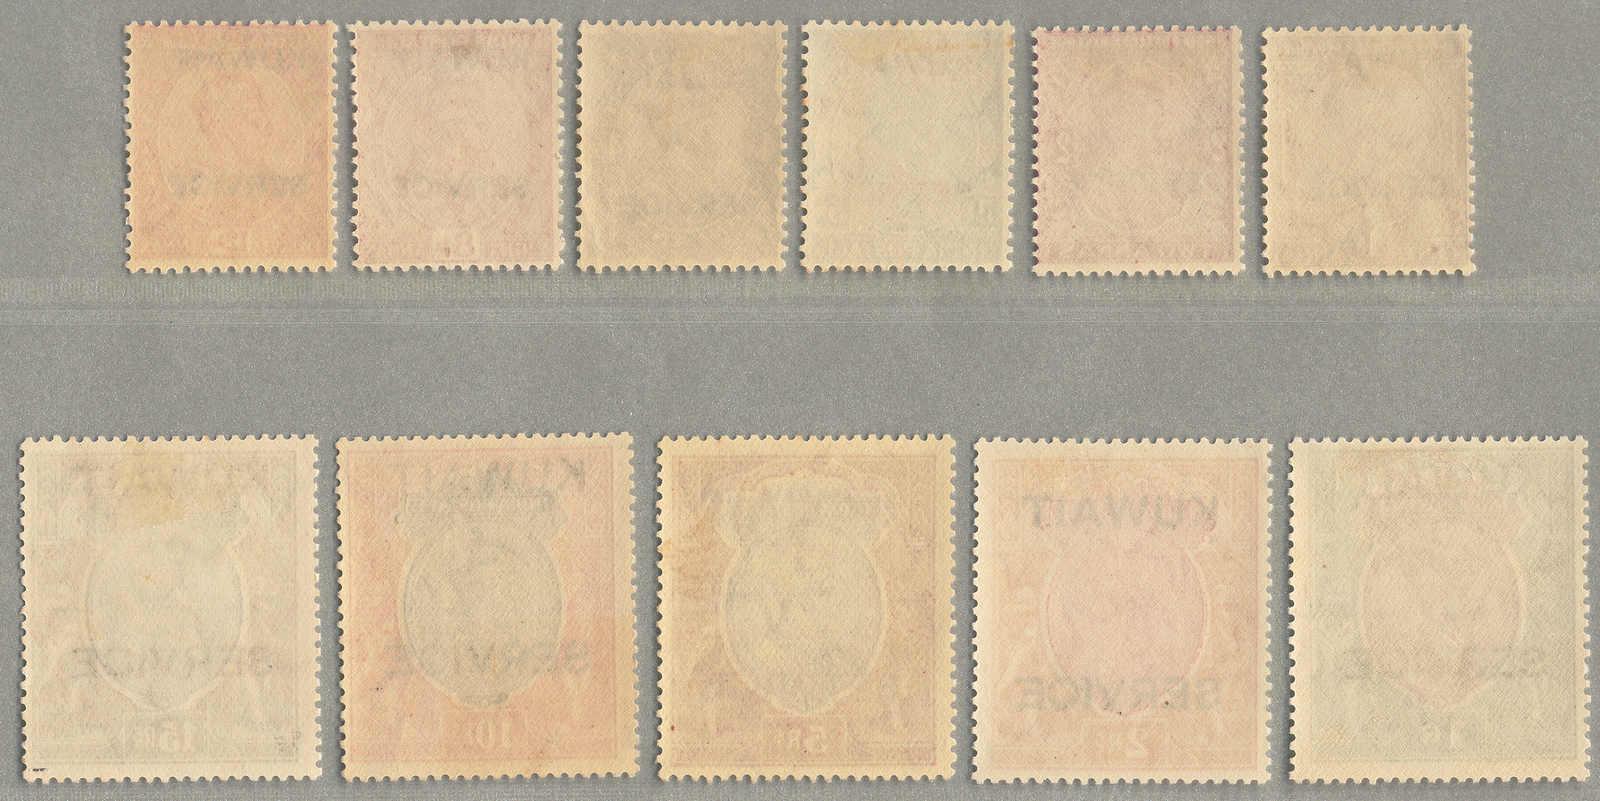 Lot 21268 - andere gebiete Kuwait Britische Periode -  classicphil GmbH 7'th classicphil Auction - Day 2